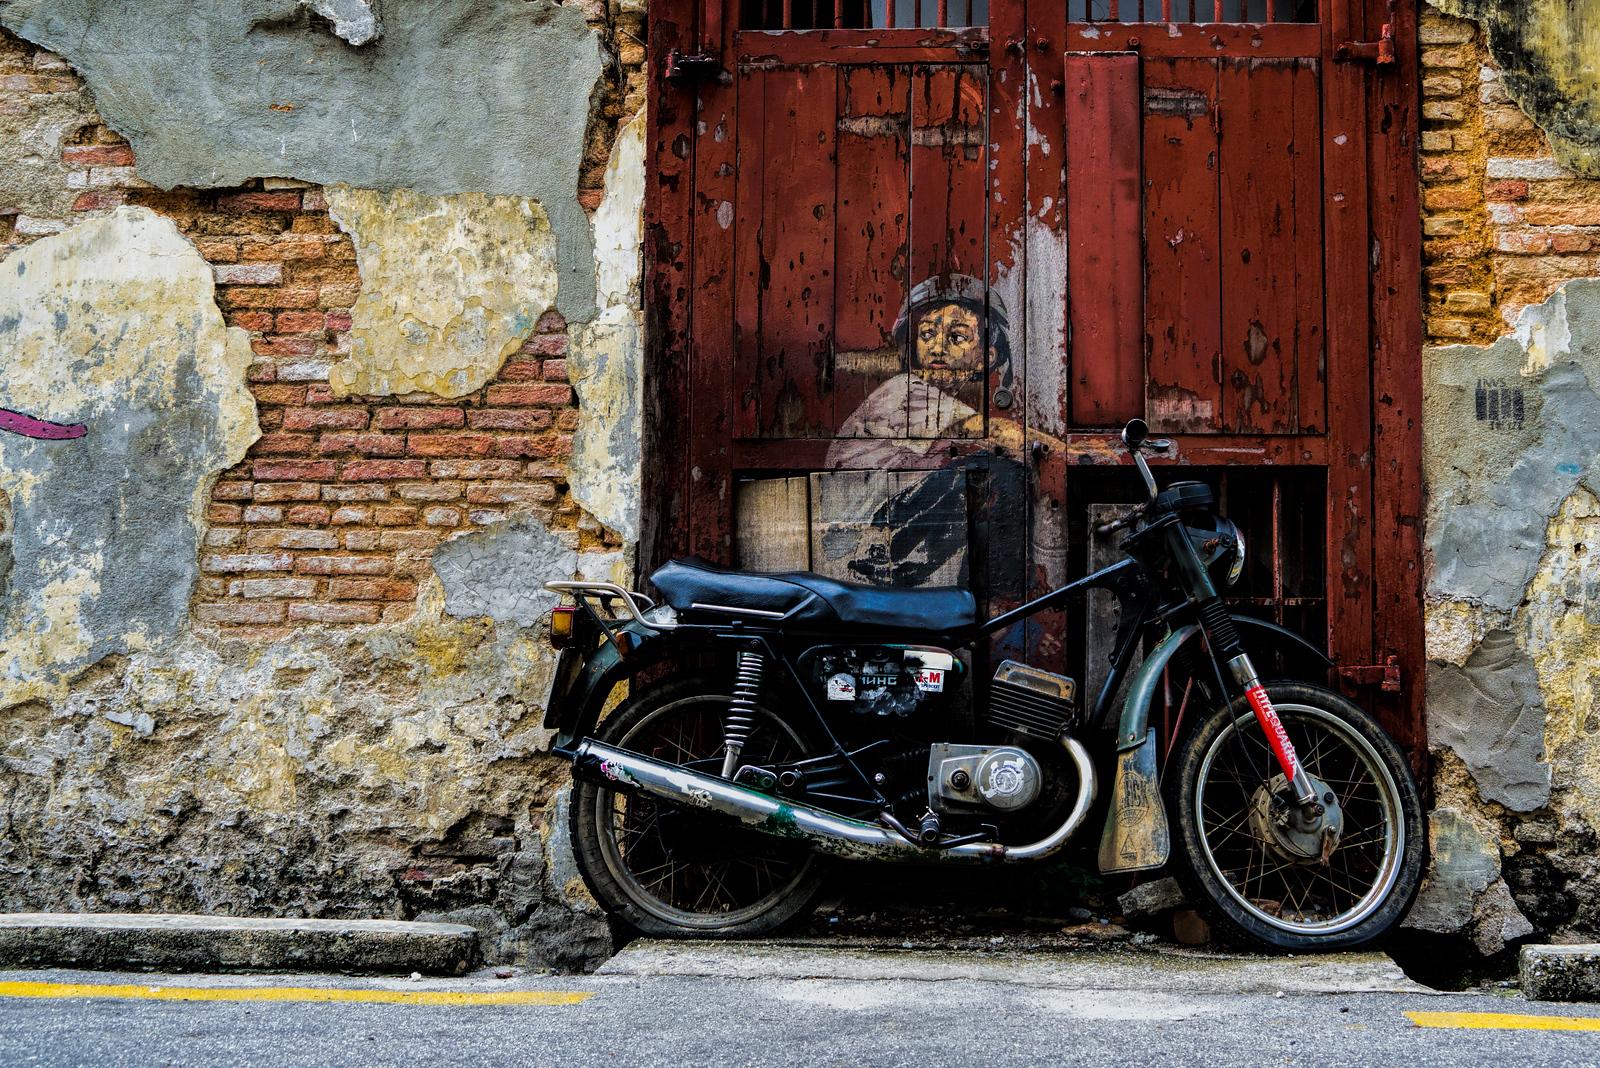 Penang Street Art - Boy on Motorbike